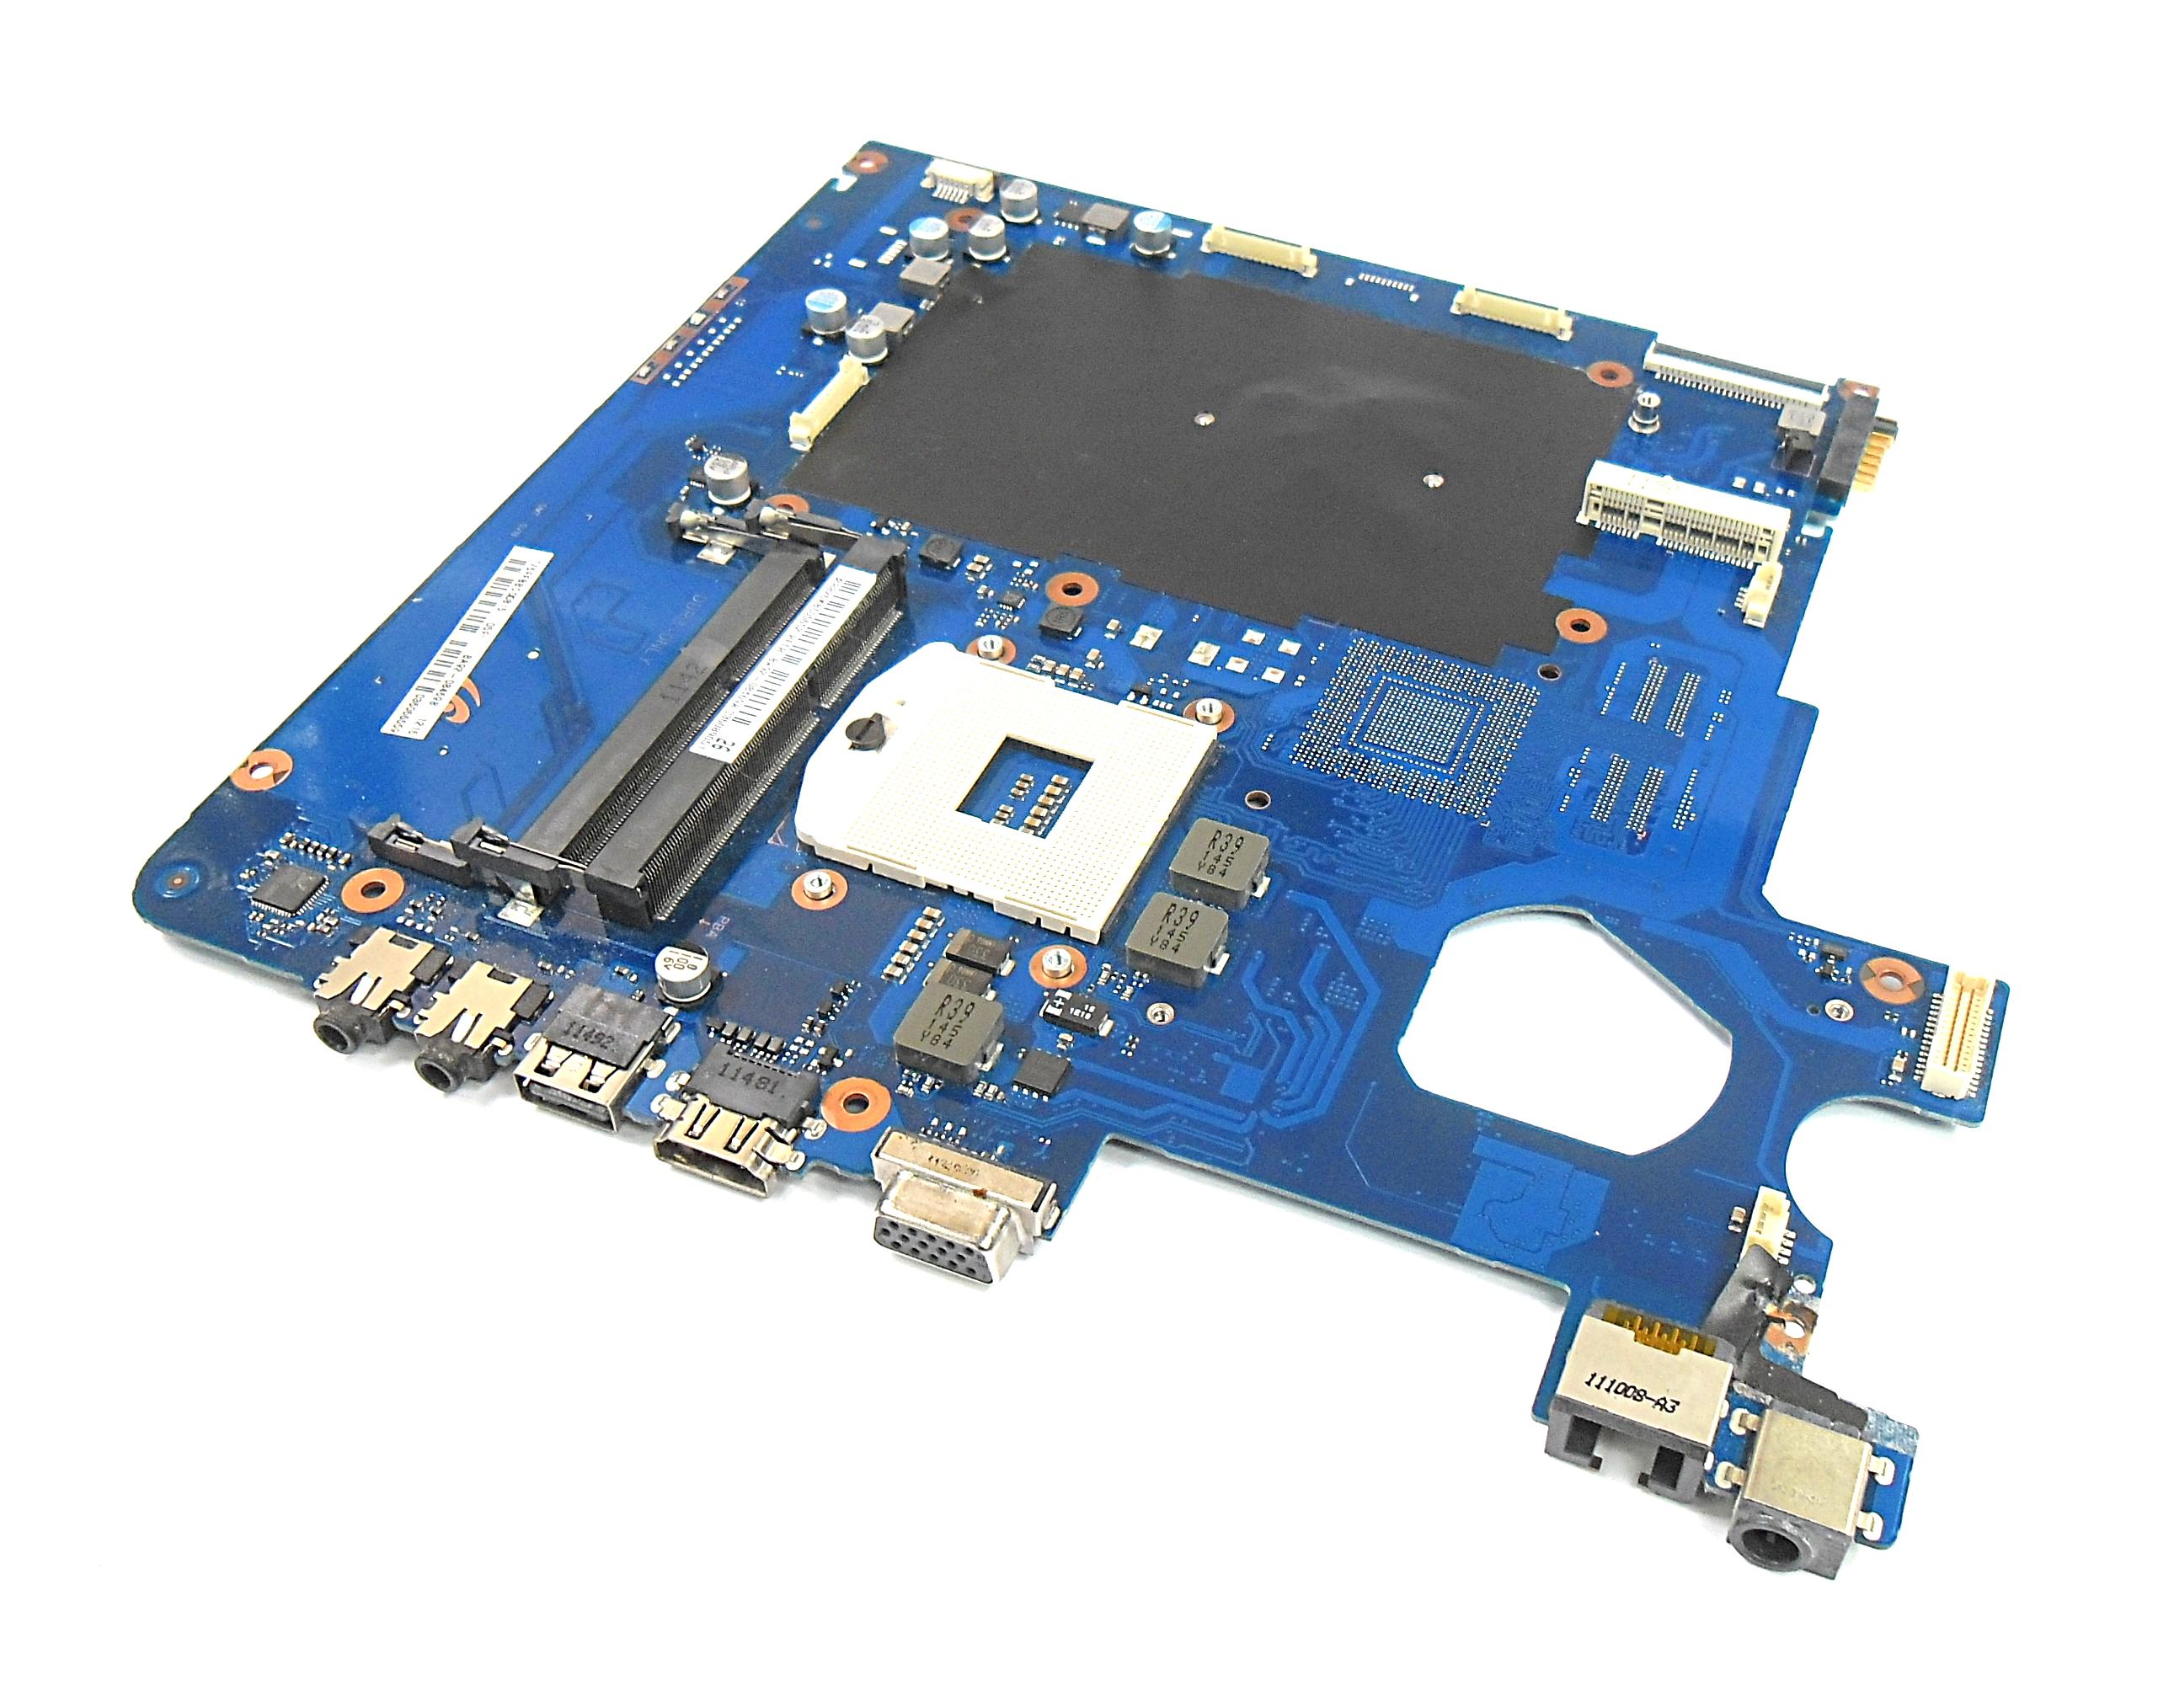 BA92-08469 Samsung NP300V5A-A01DX Intel PGA 989 Motherboard